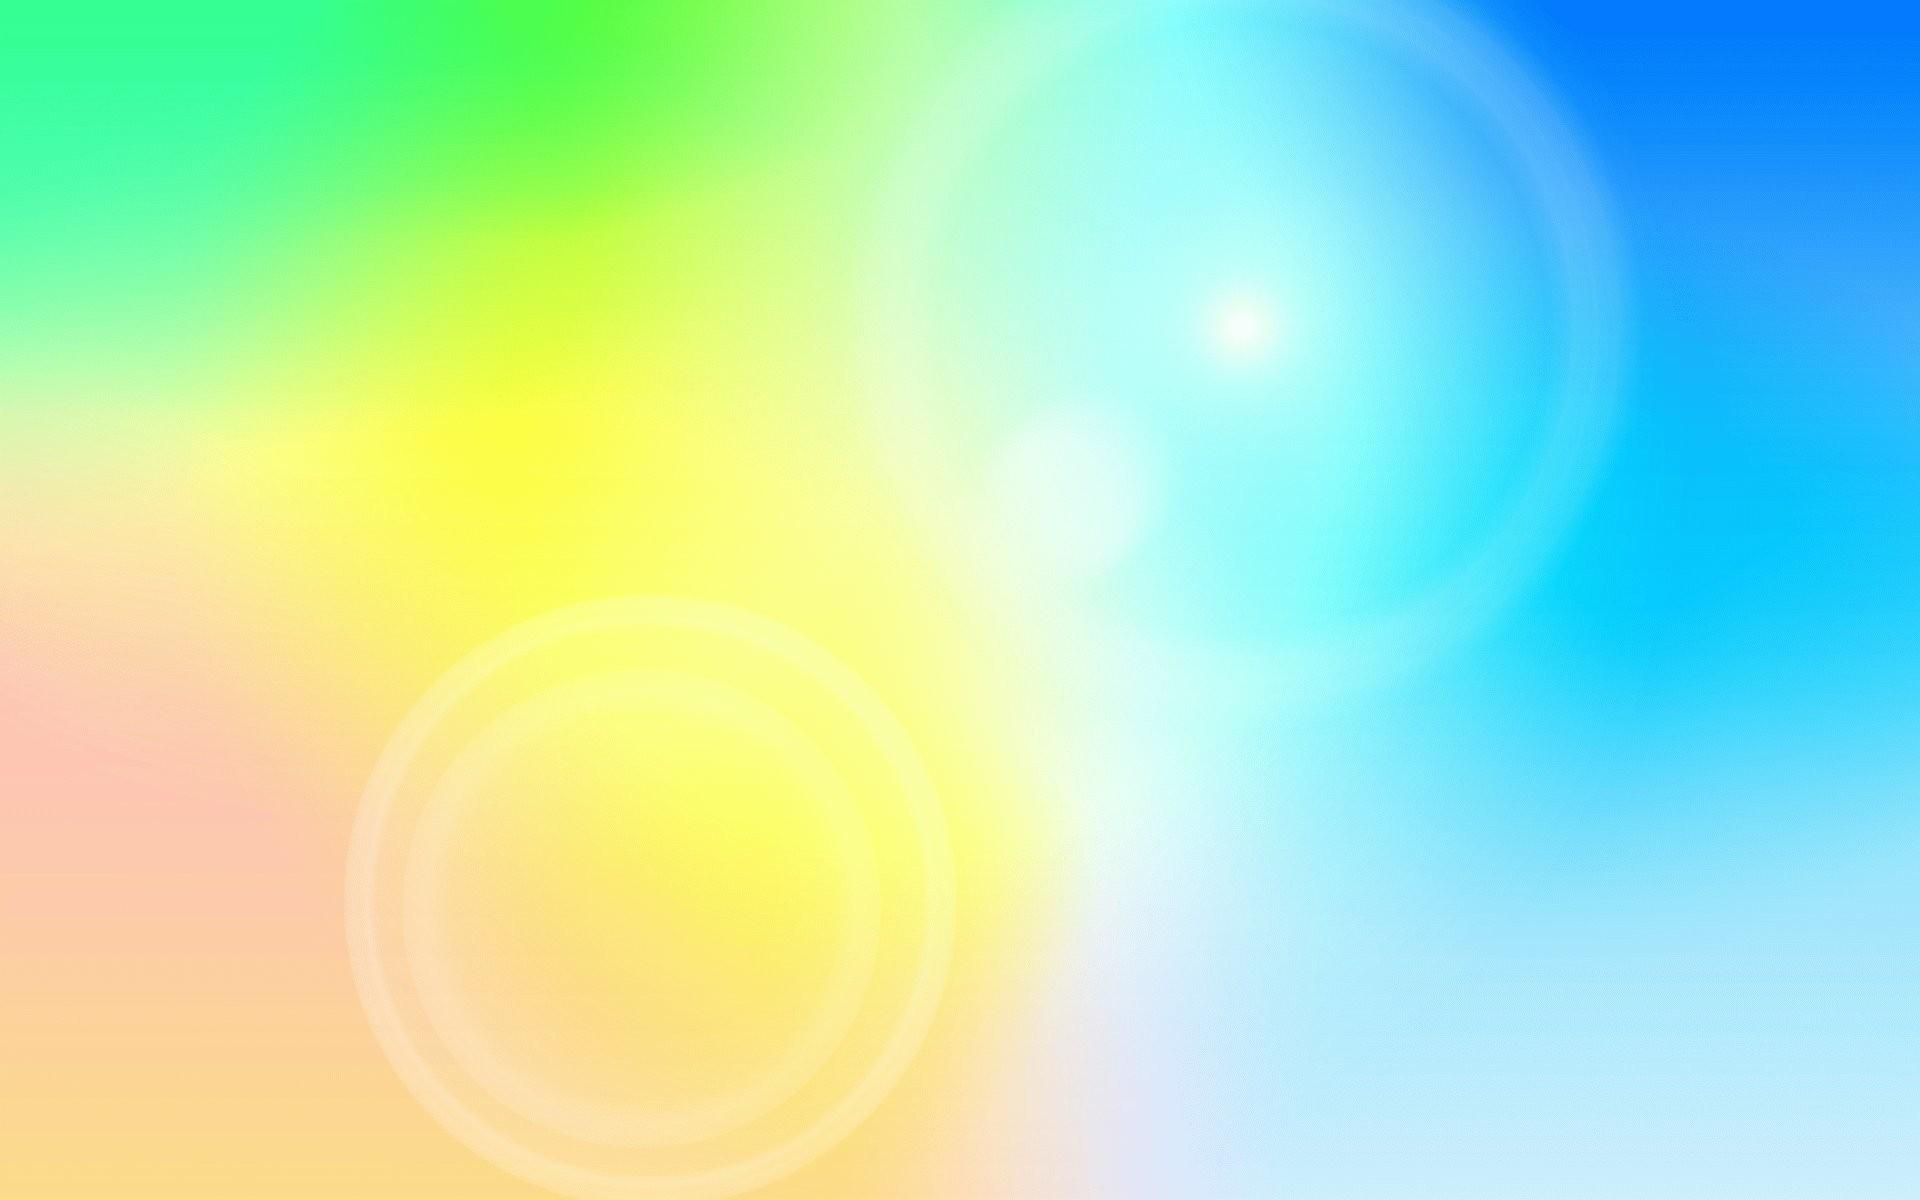 Light Background Wallpaper 22923